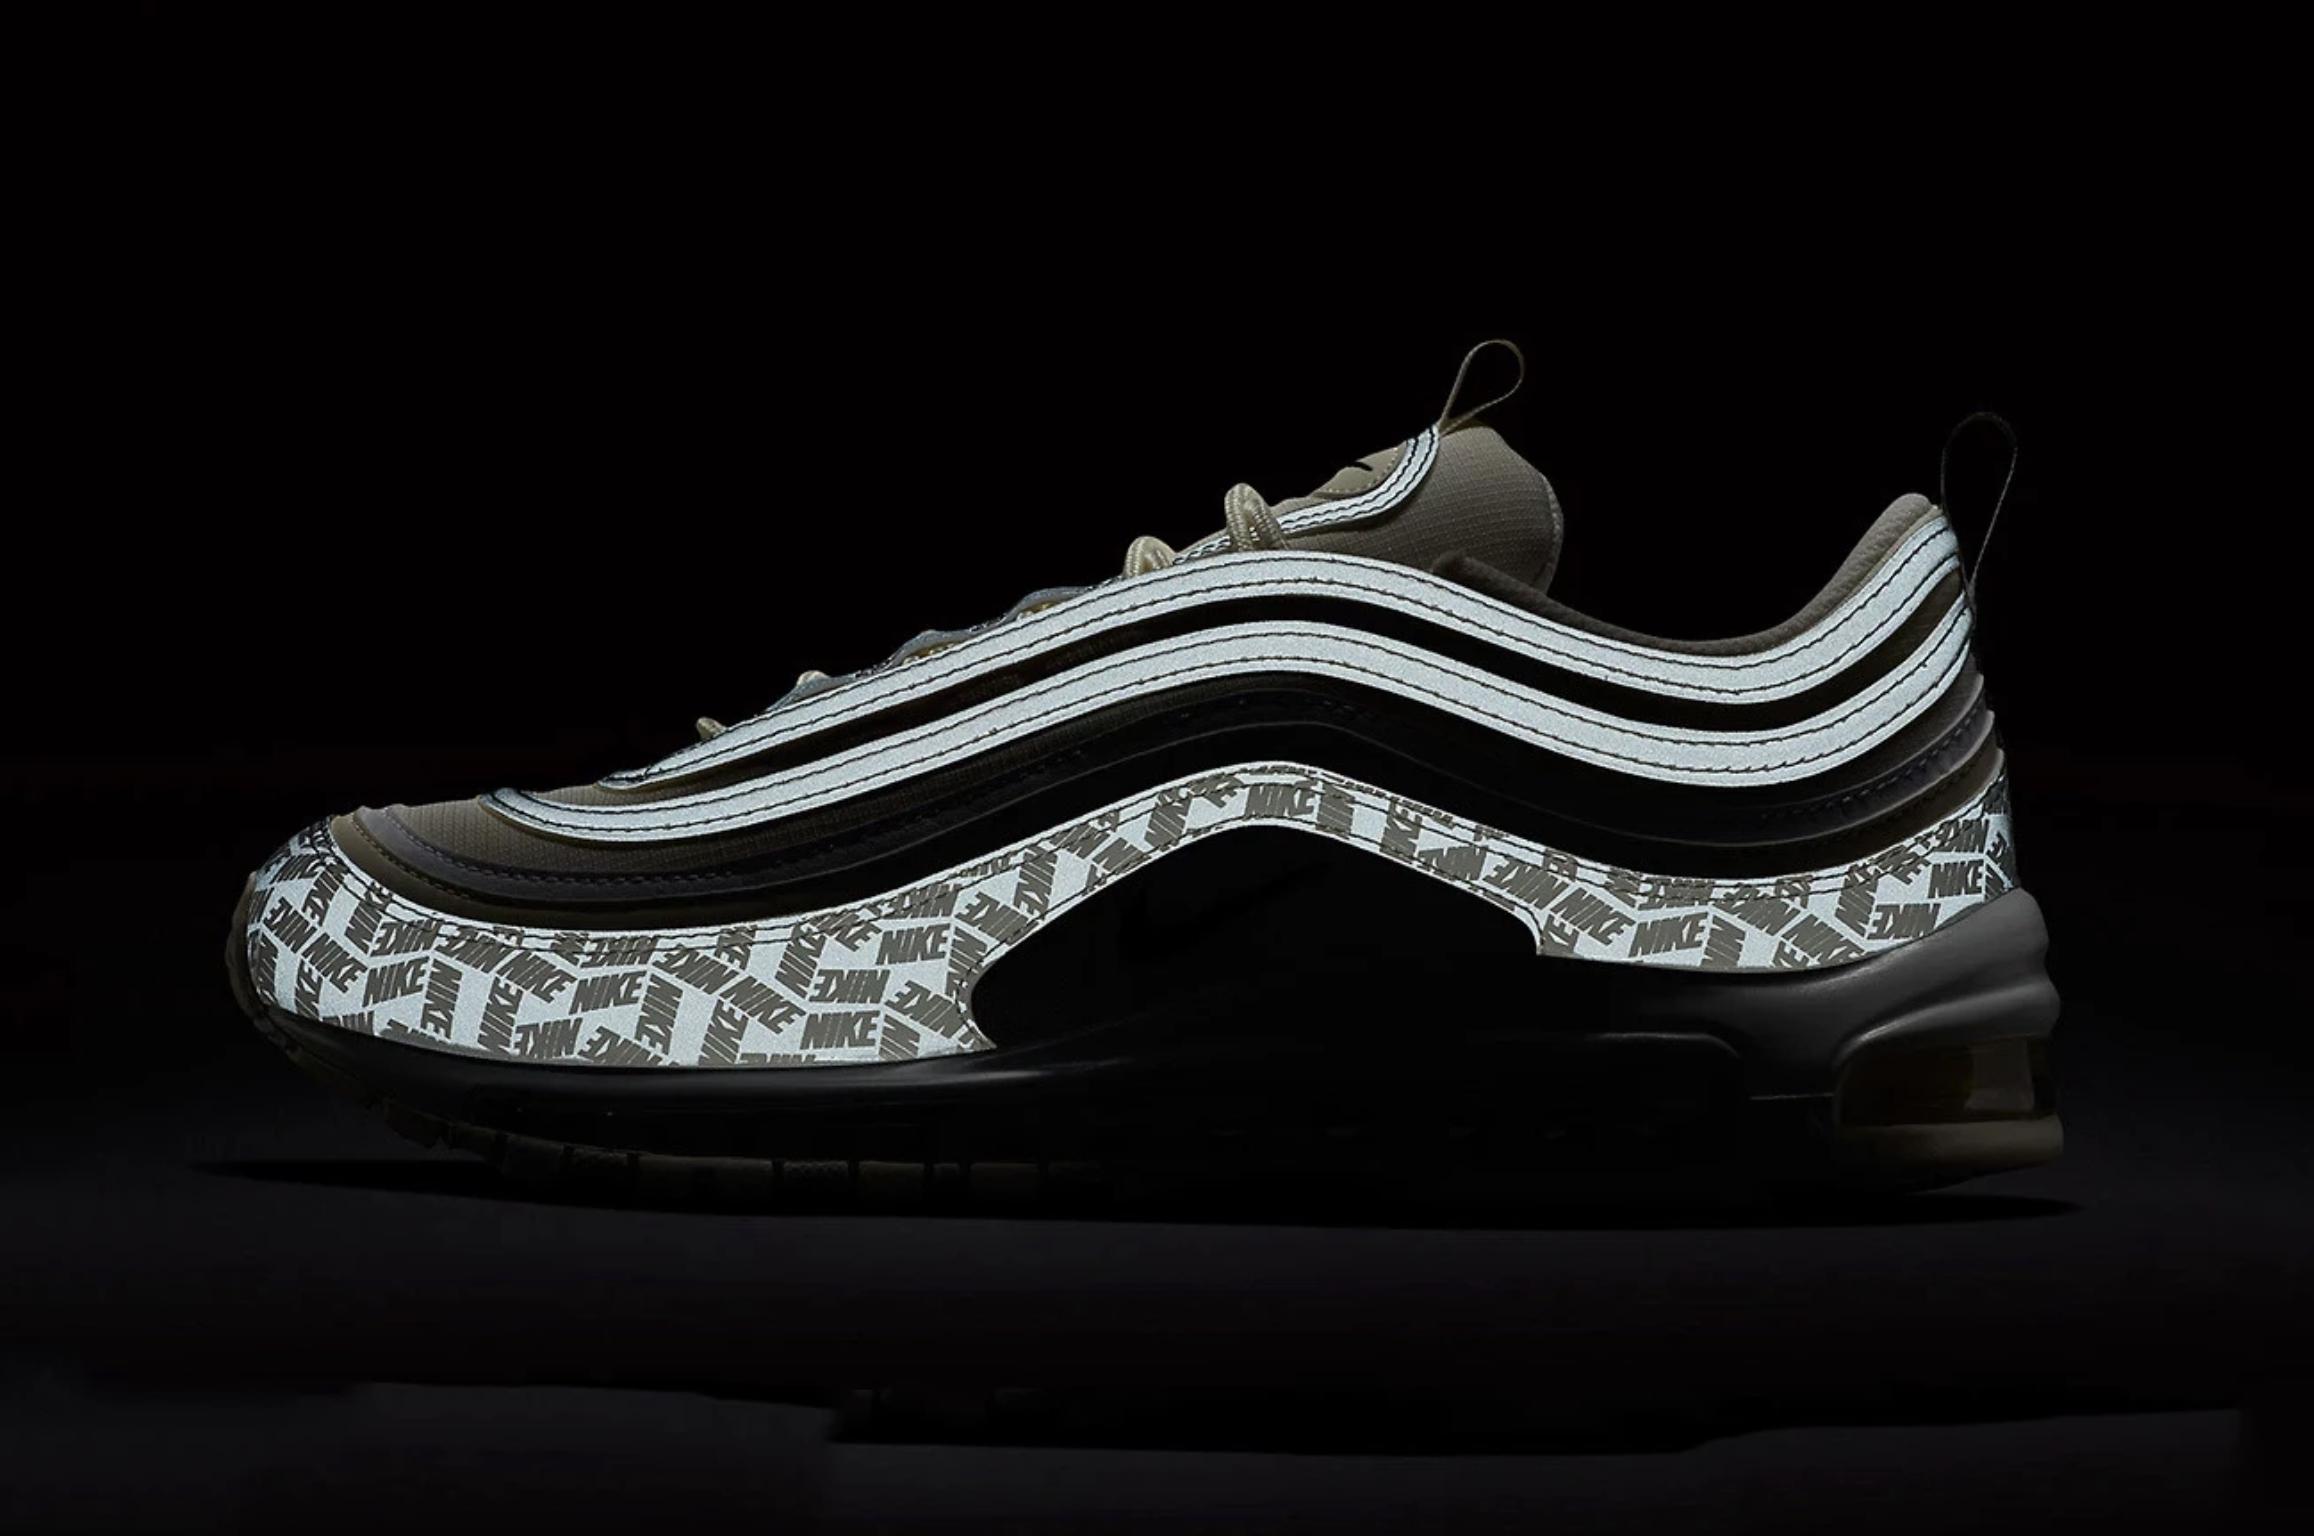 Nike Air Max 97 Reflective Shine Pack